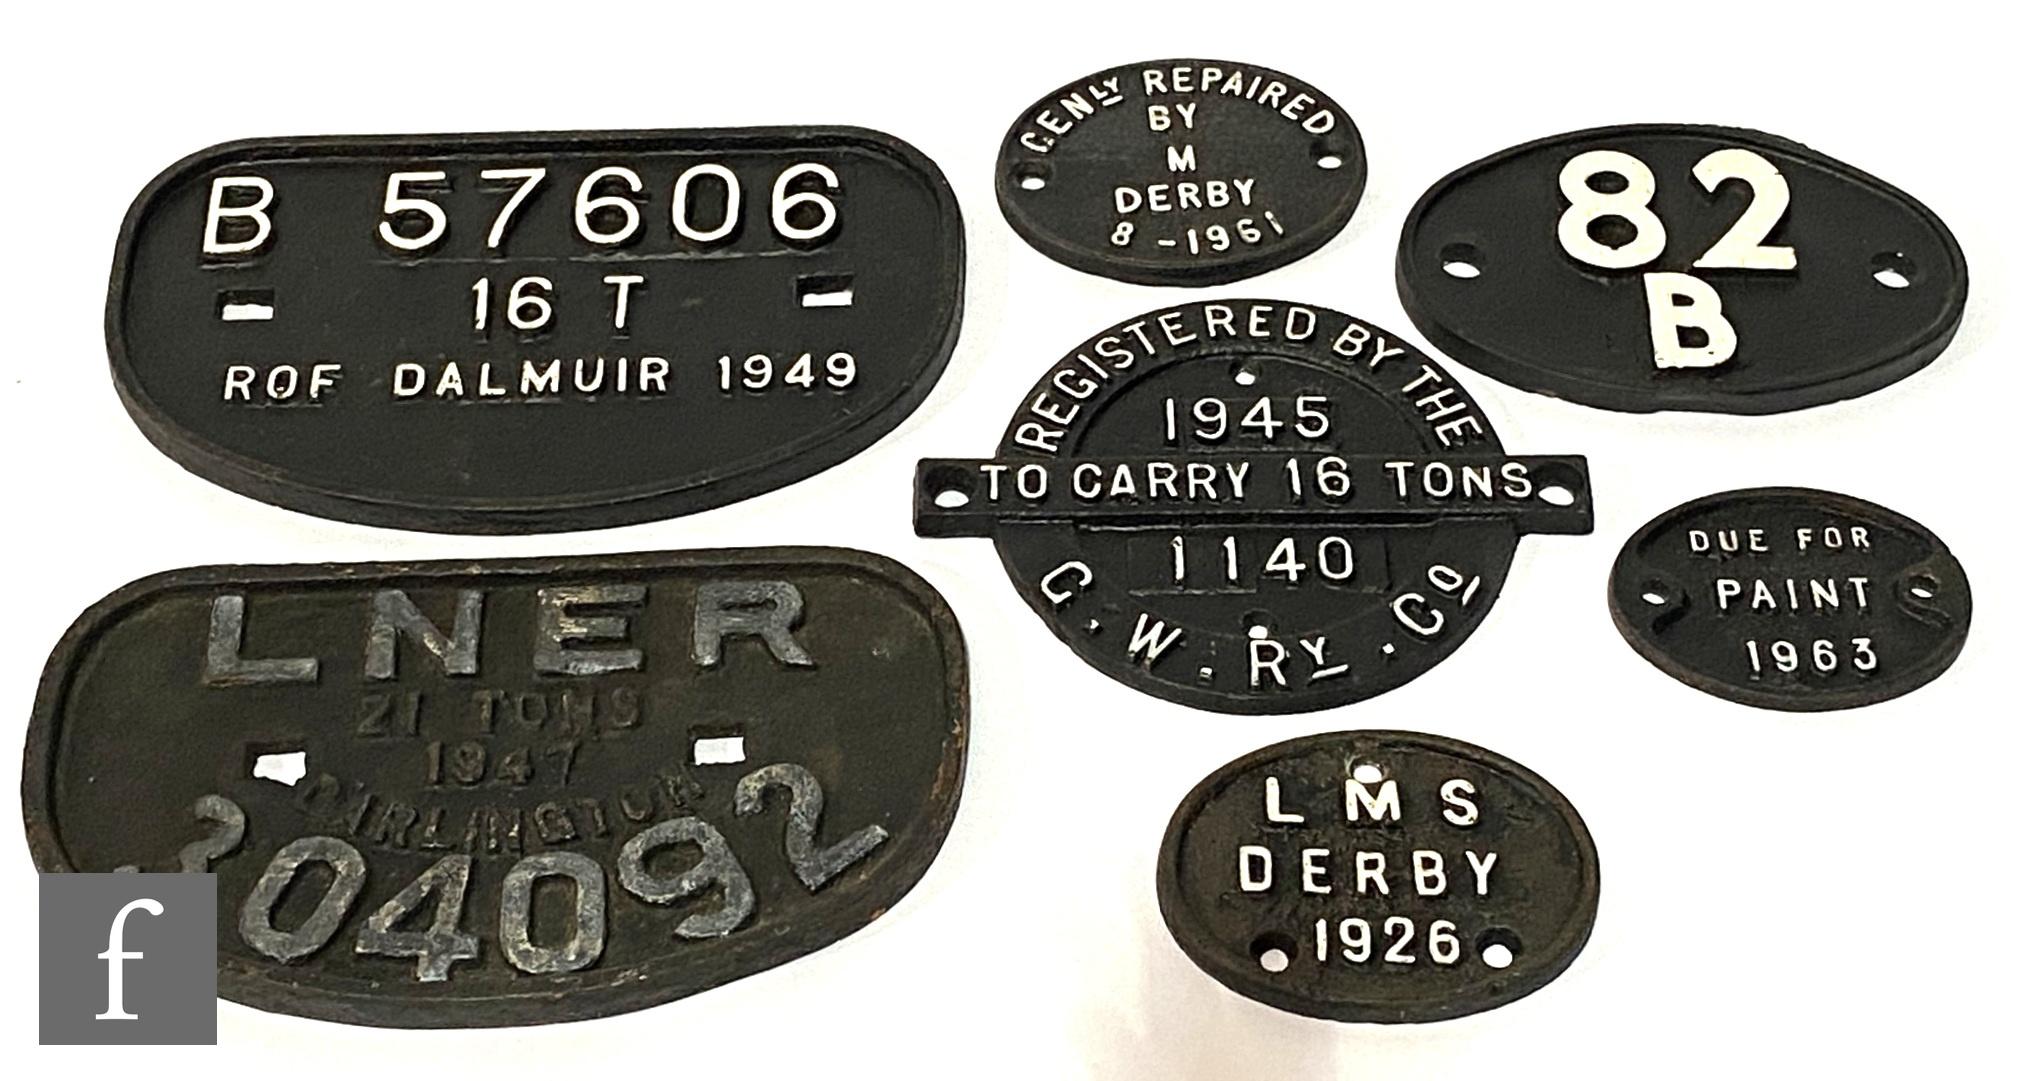 Various railway wagon plates LNER Darlington No 304092, another B 57606, 16T, ROF Dalmuir 1949, a